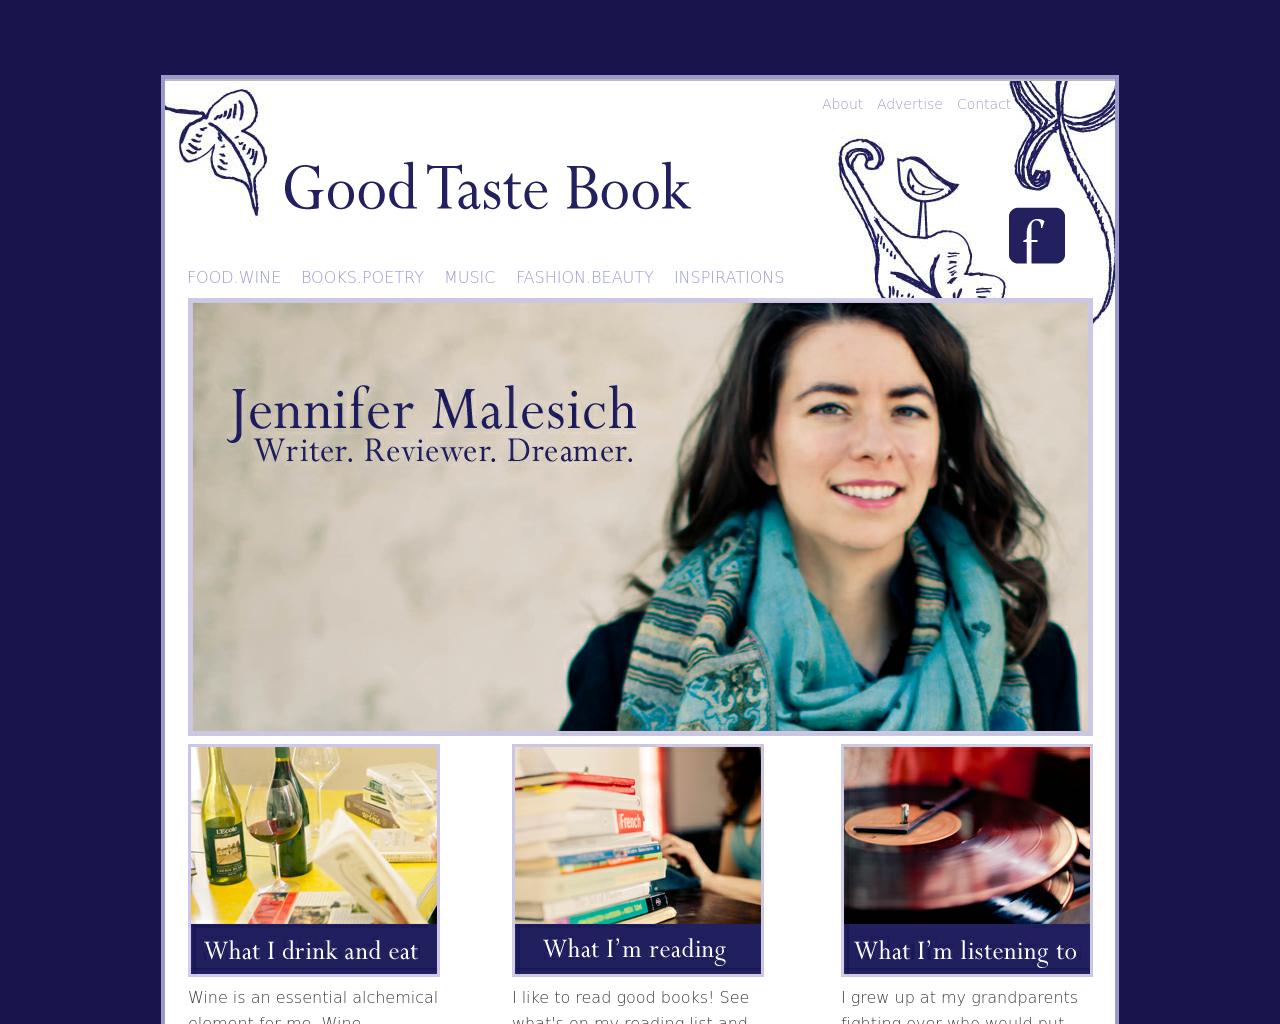 Good-Taste-Book-Advertising-Reviews-Pricing